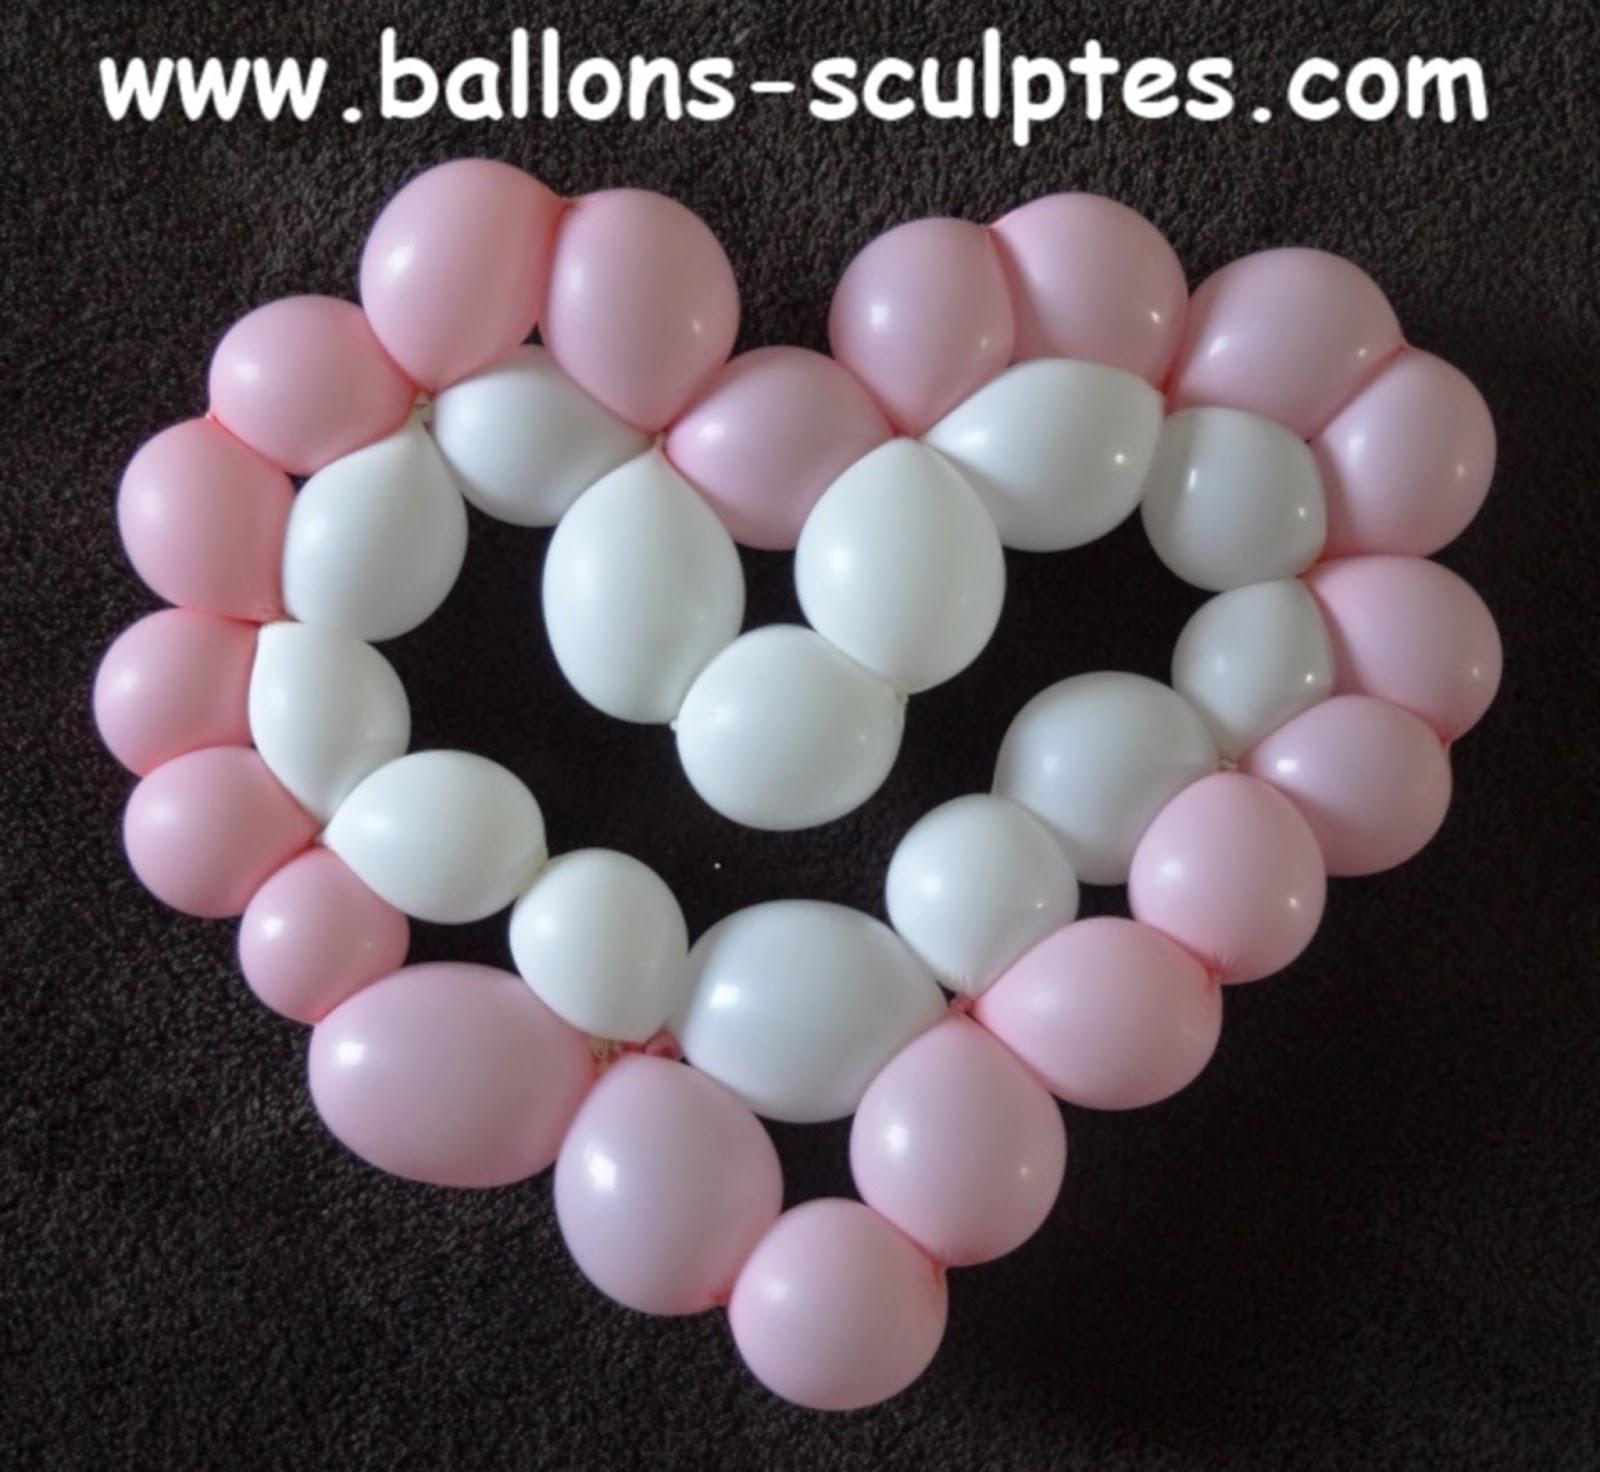 coeur bicolore en ballons